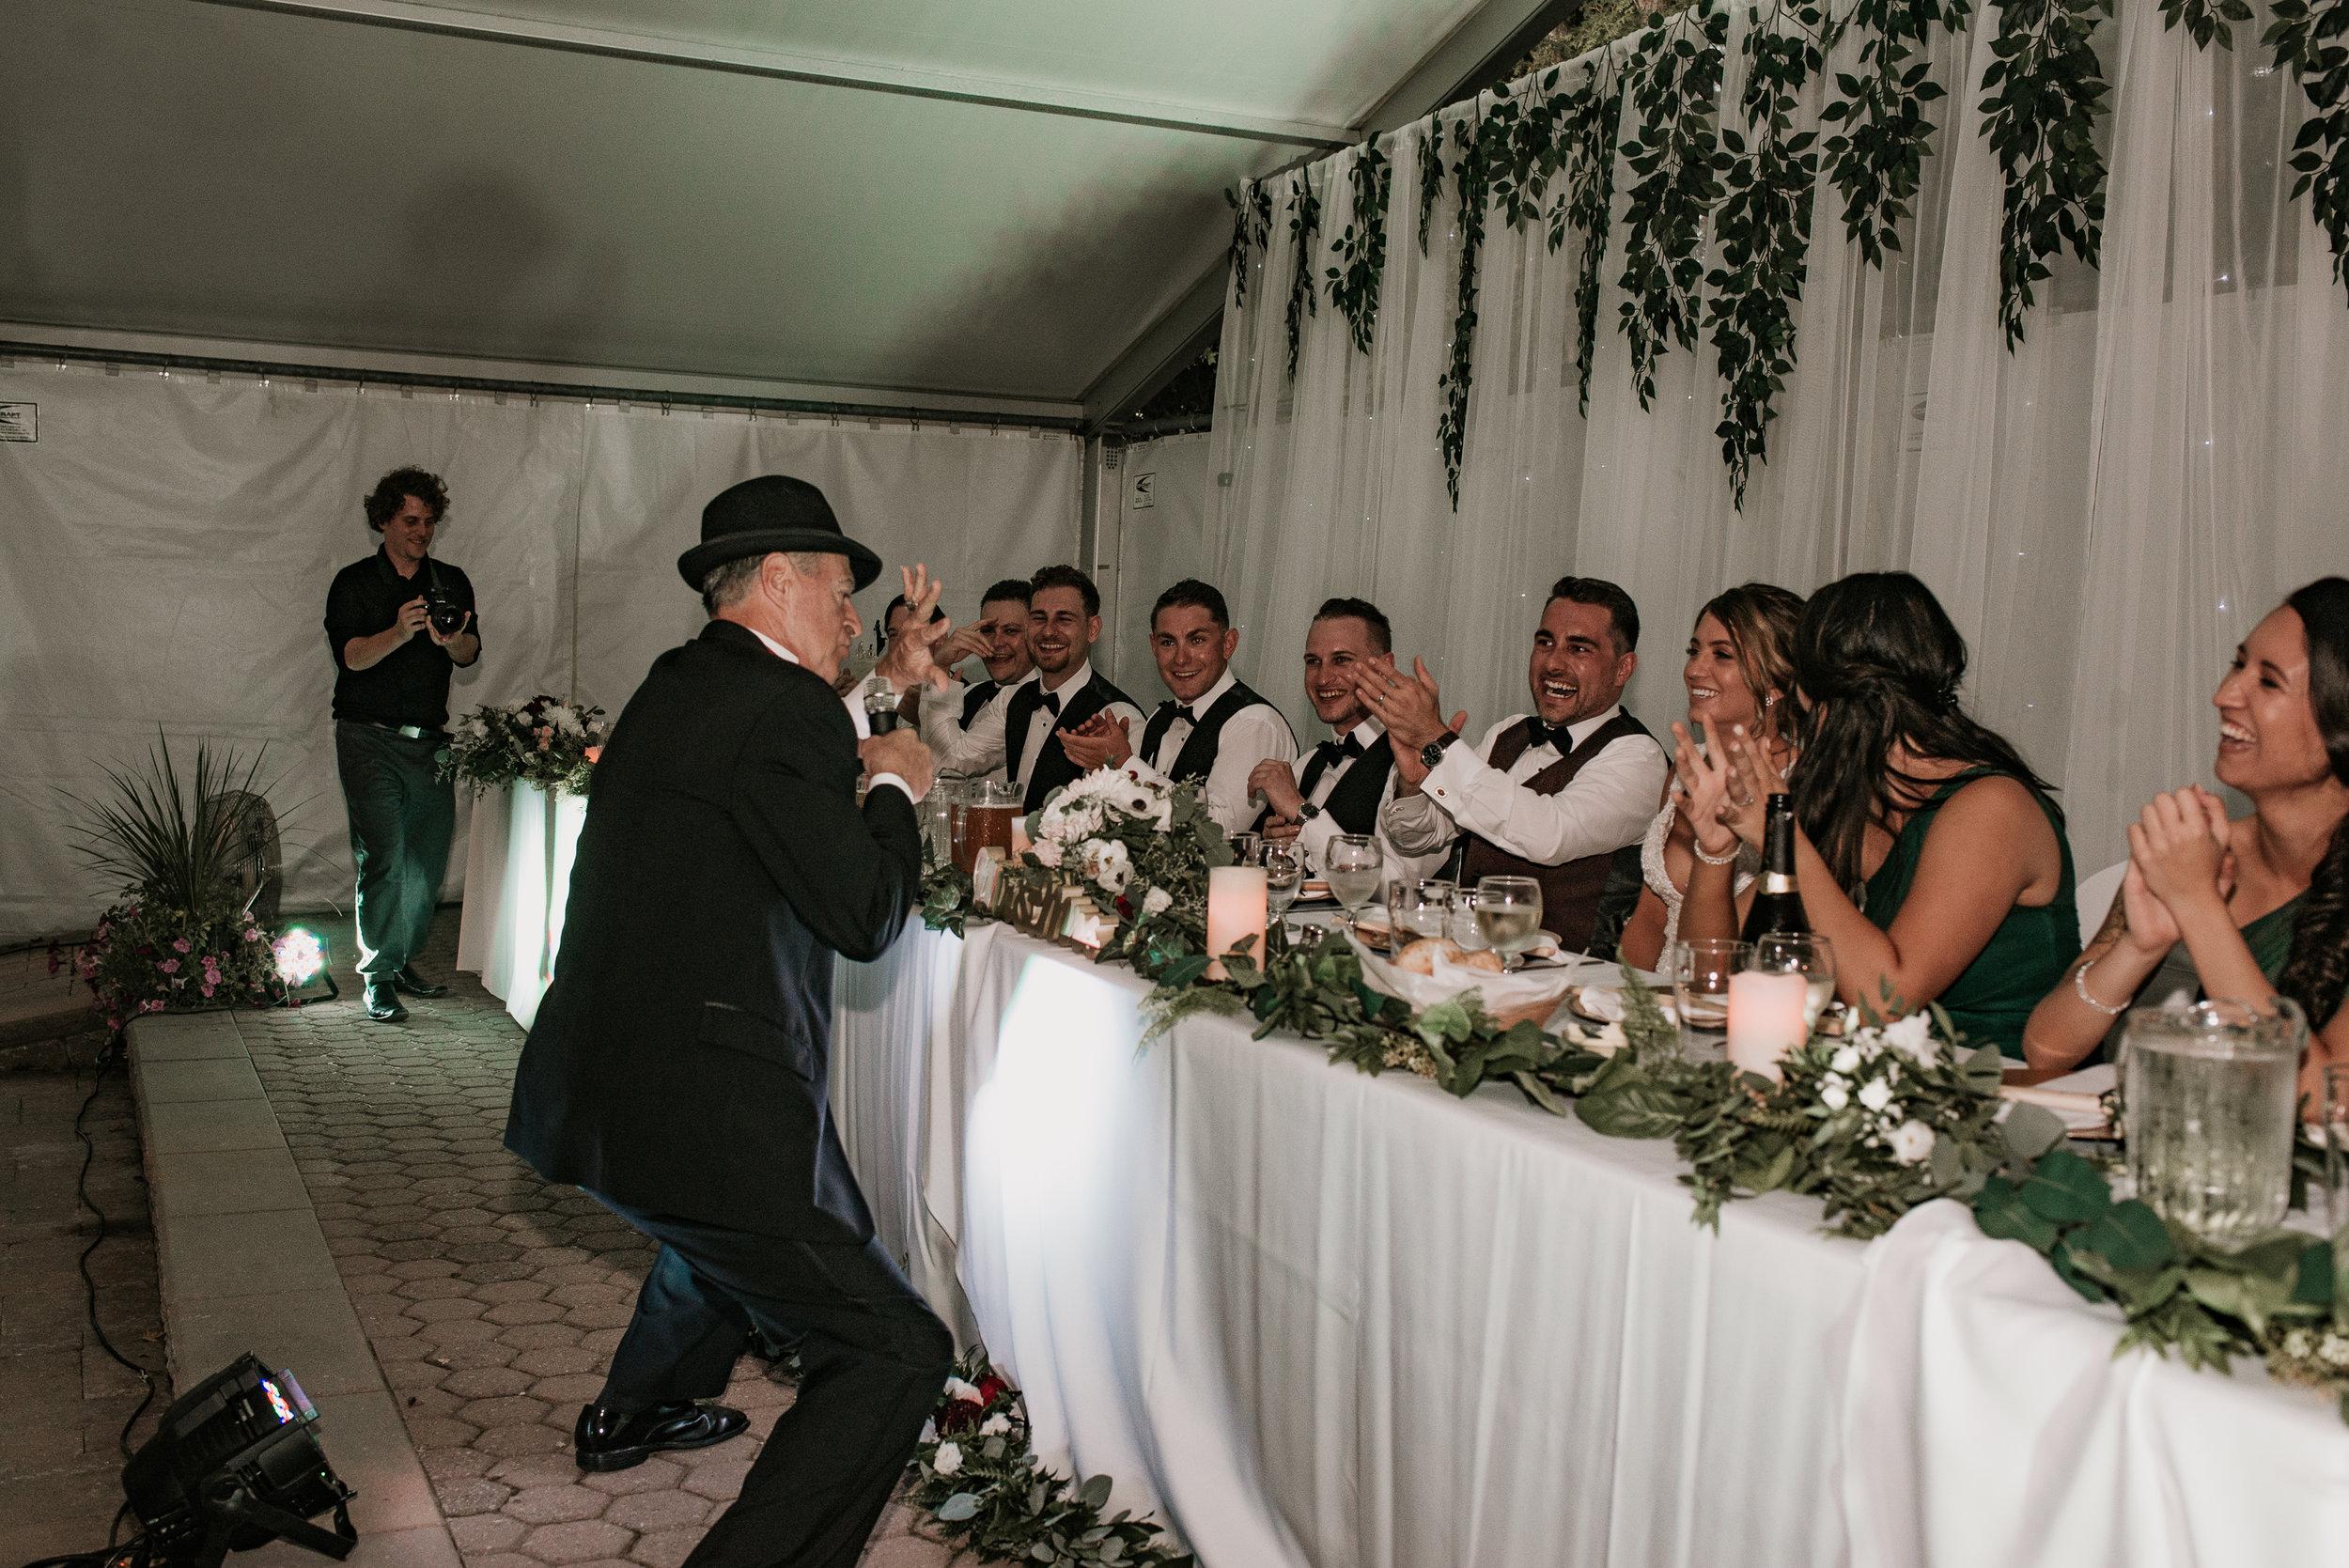 Claremont_fourseasons_Wedding-420.jpg